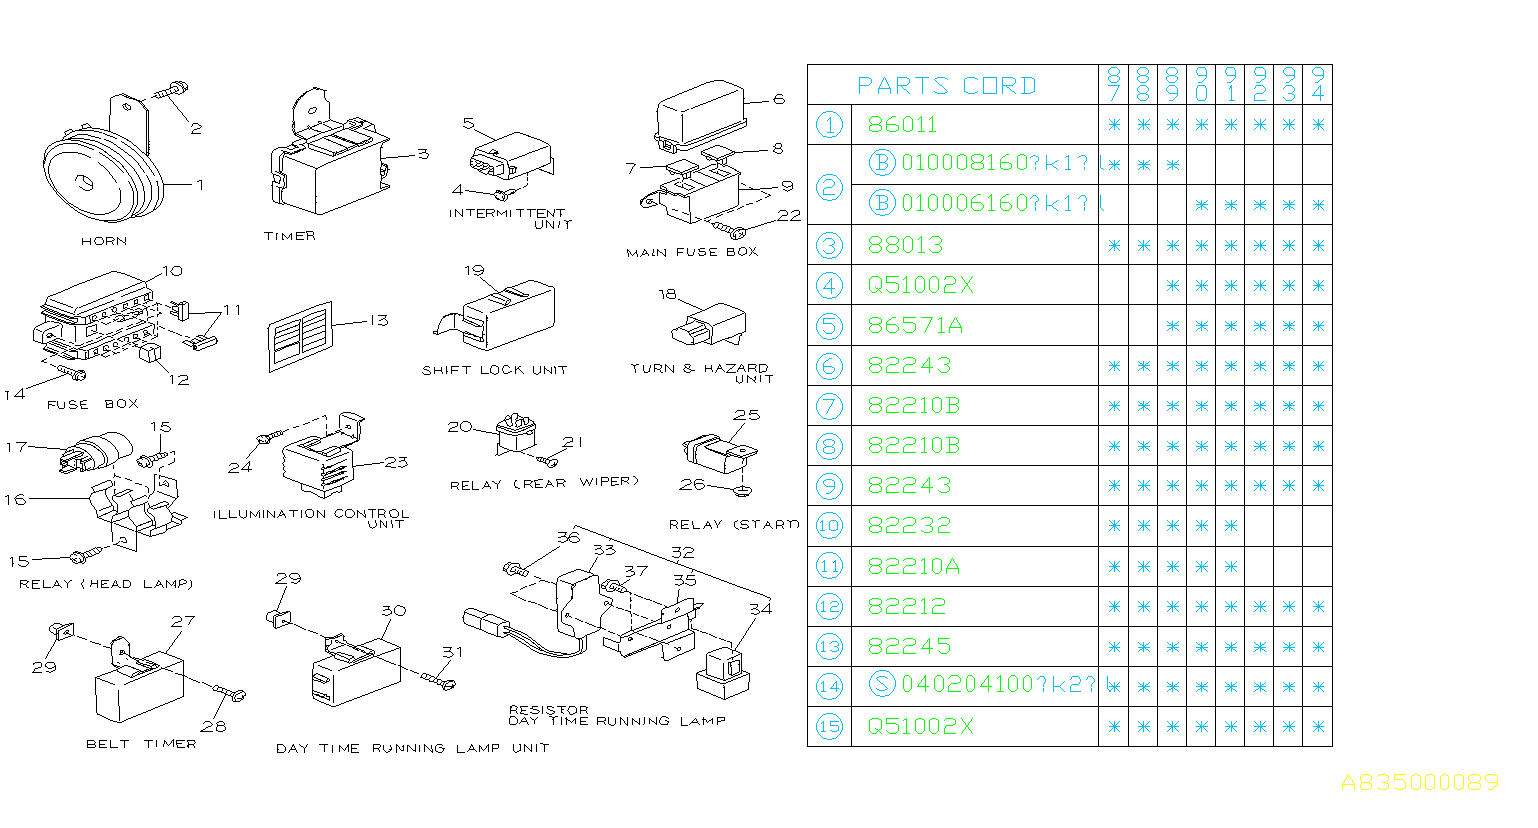 Subaru Justy Fuse Puller  Box  Wiring  Harness